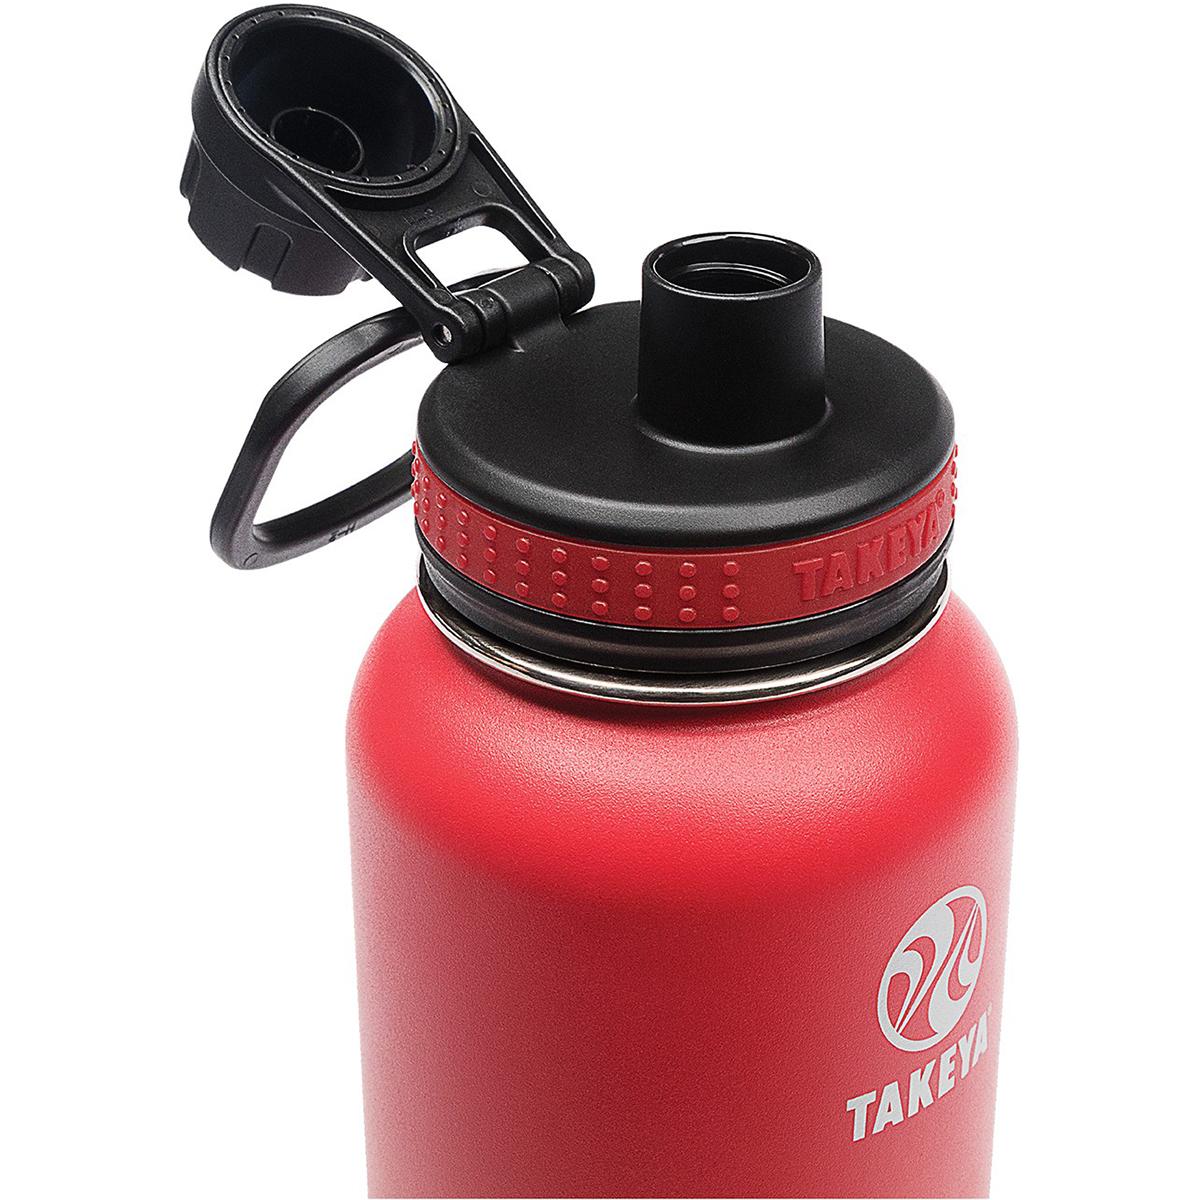 Takeya-Originals-40-oz-Insulated-Stainless-Steel-Water-Bottle thumbnail 15